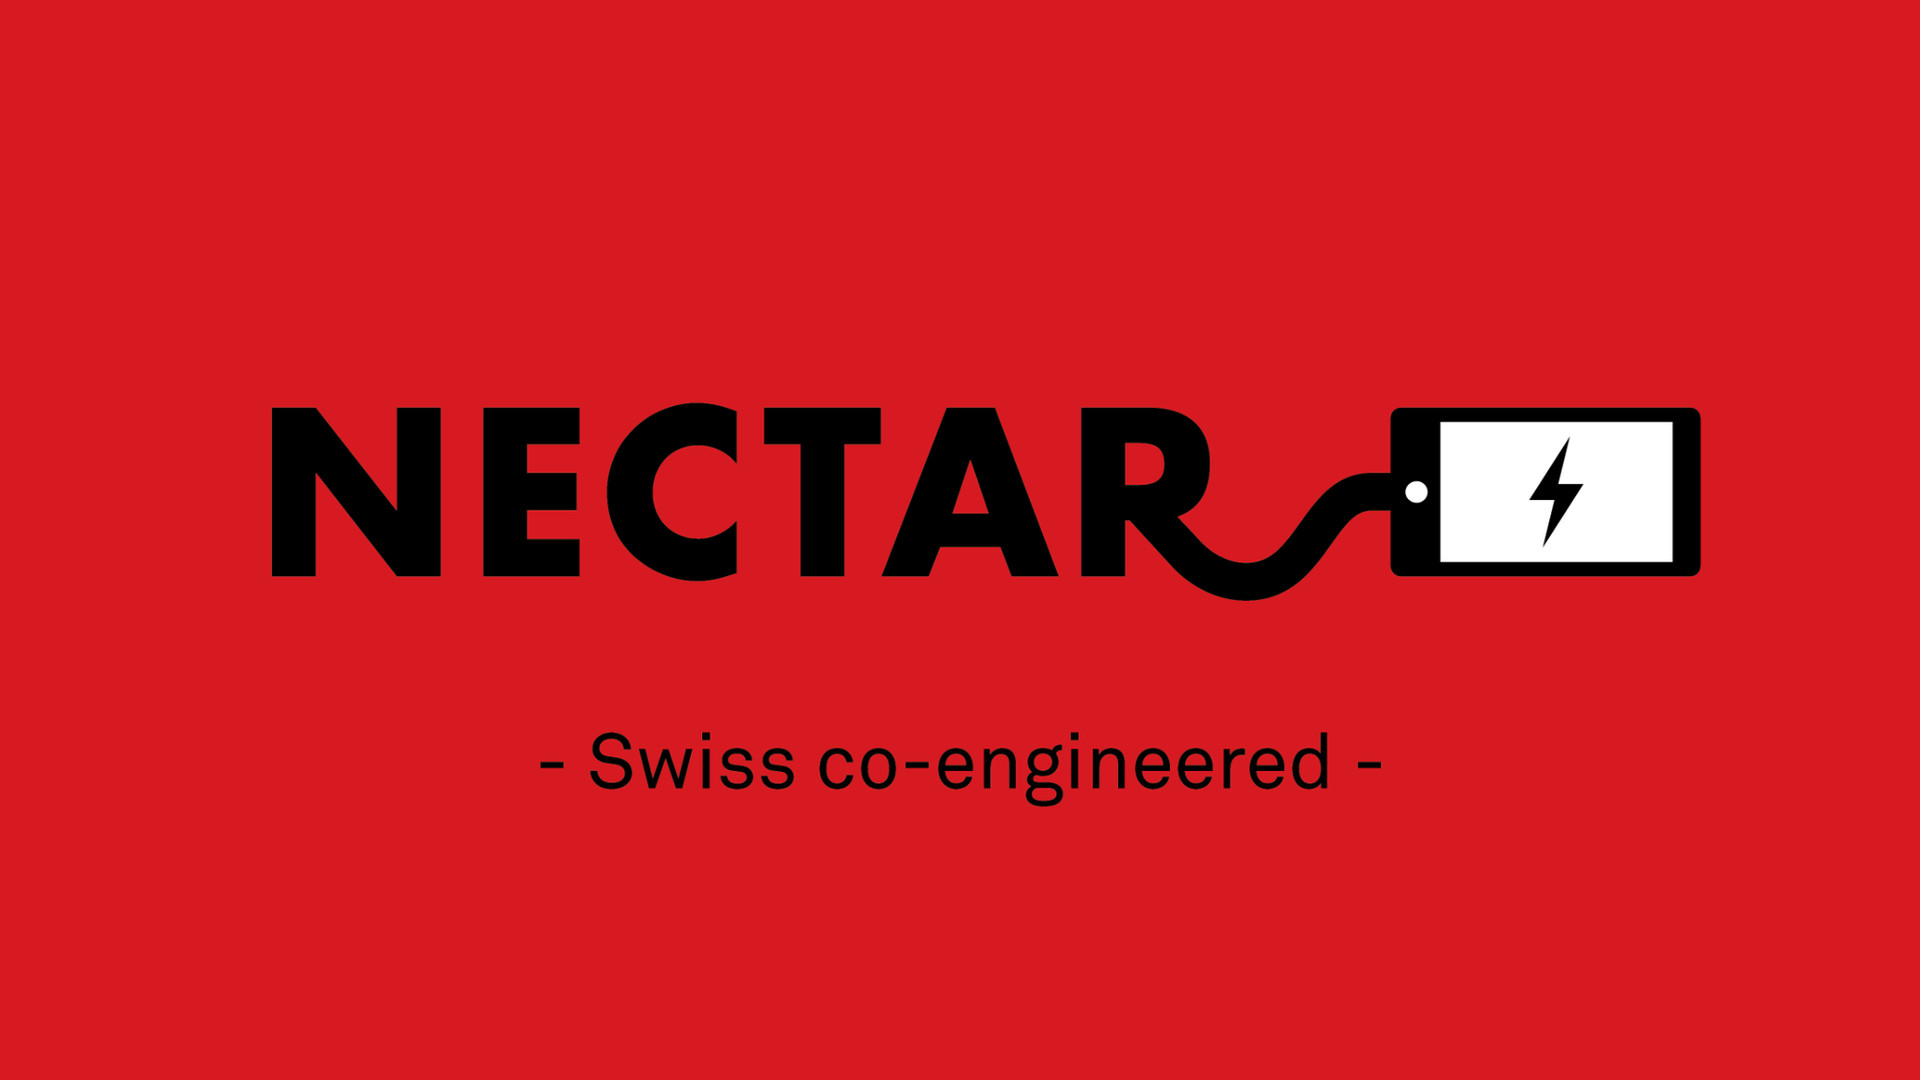 Nectar Logo 2120px X 1192px.jpg